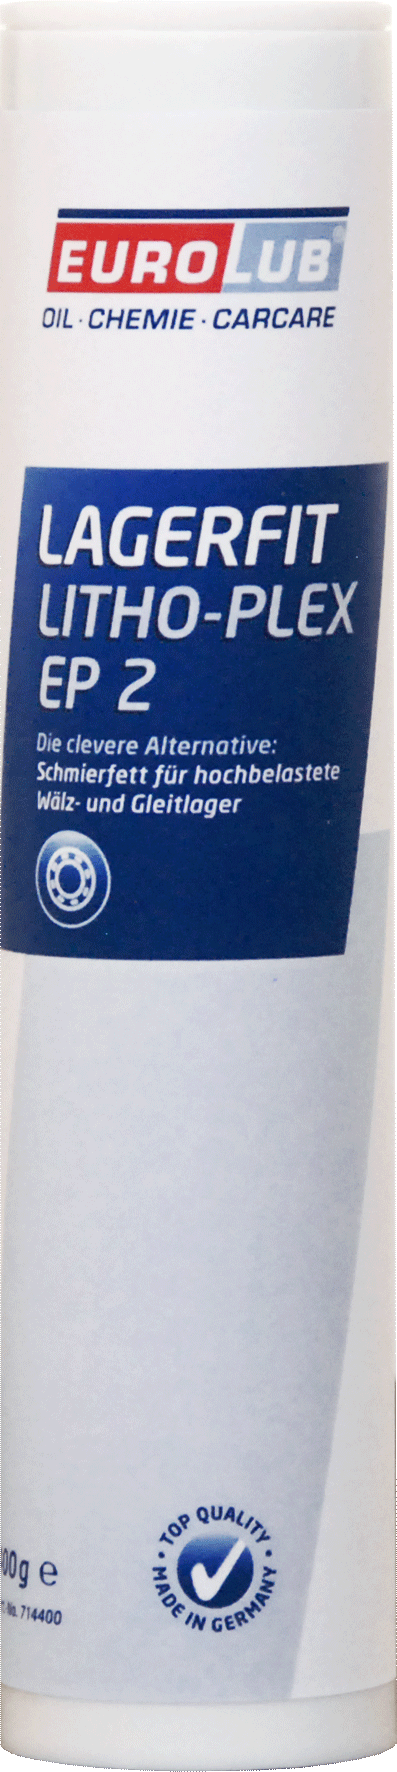 EUROLUB Lagerfit Lithoplex EP 2 (литиевая смазка, c повышеной рабочей температурой), 0.4л